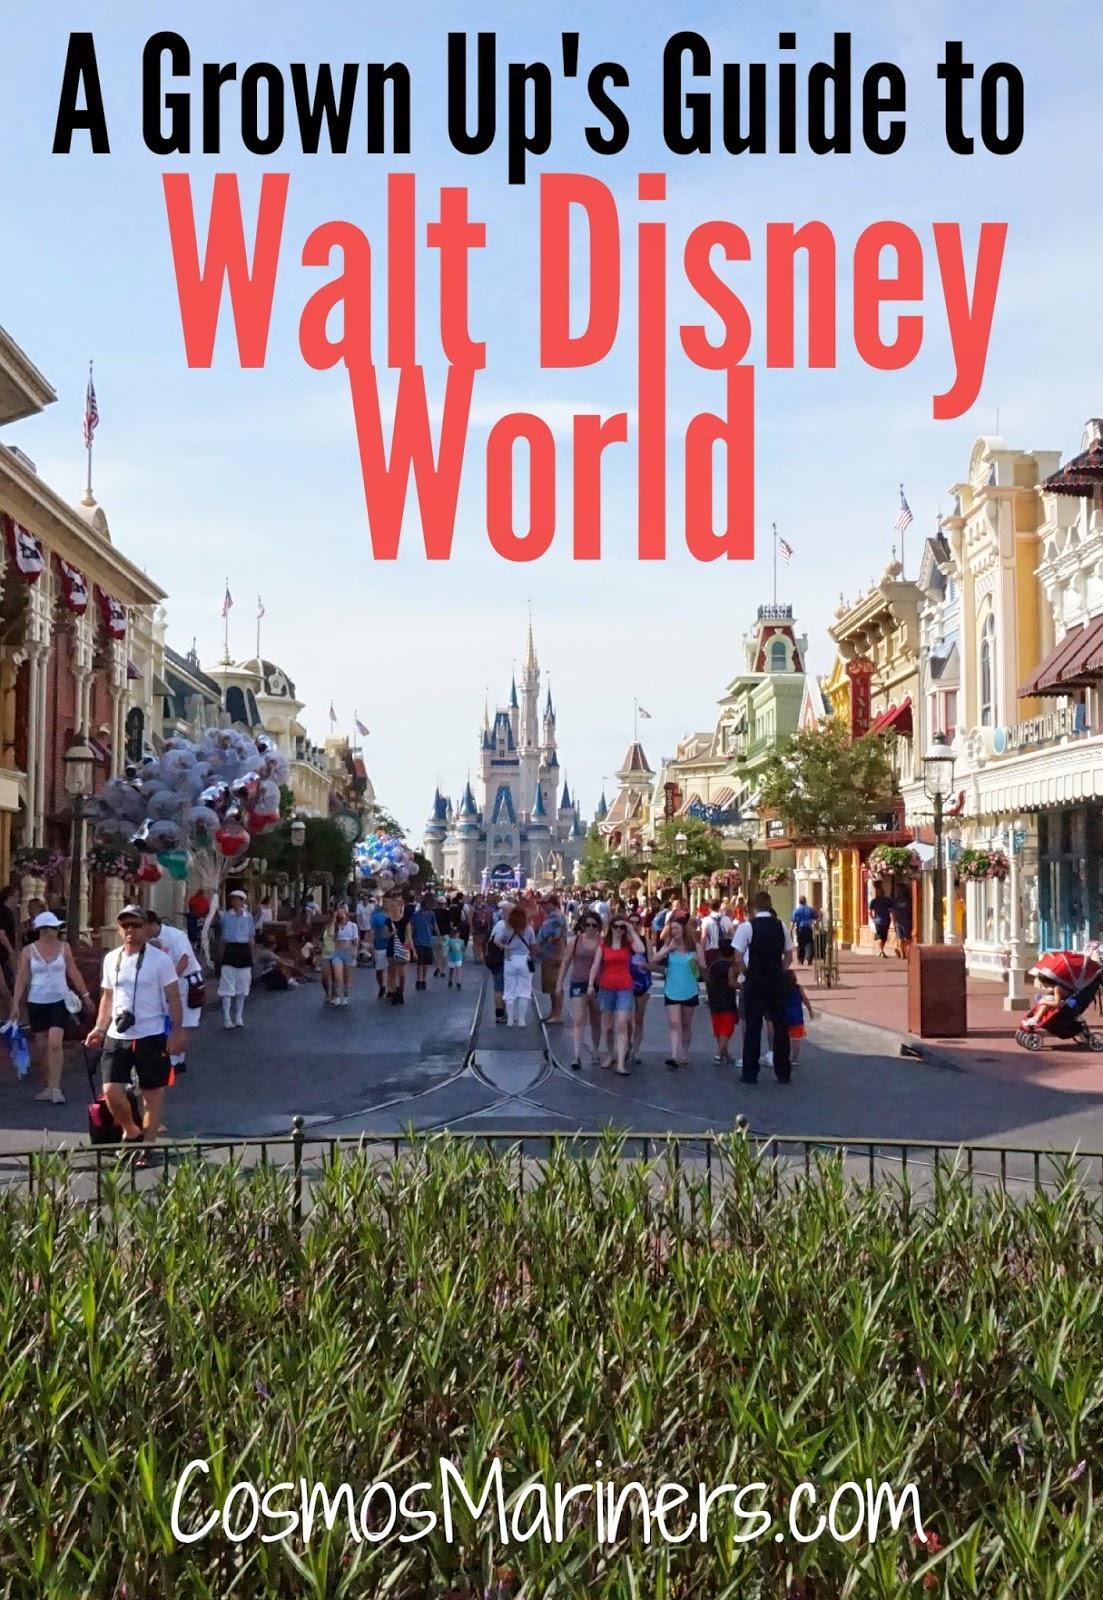 A Grown Up's Guide to Walt Disney World | CosmosMariners.com